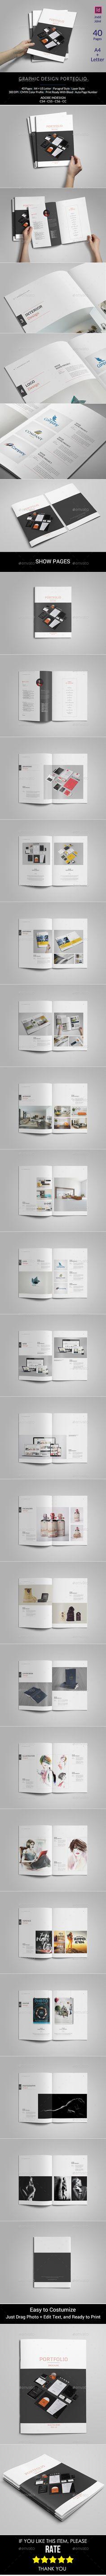 Graphic Design Portfolio Brochure Template PSD #design Download: http://graphicriver.net/item/graphic-design-portfolio-template/13500345?ref=ksioks